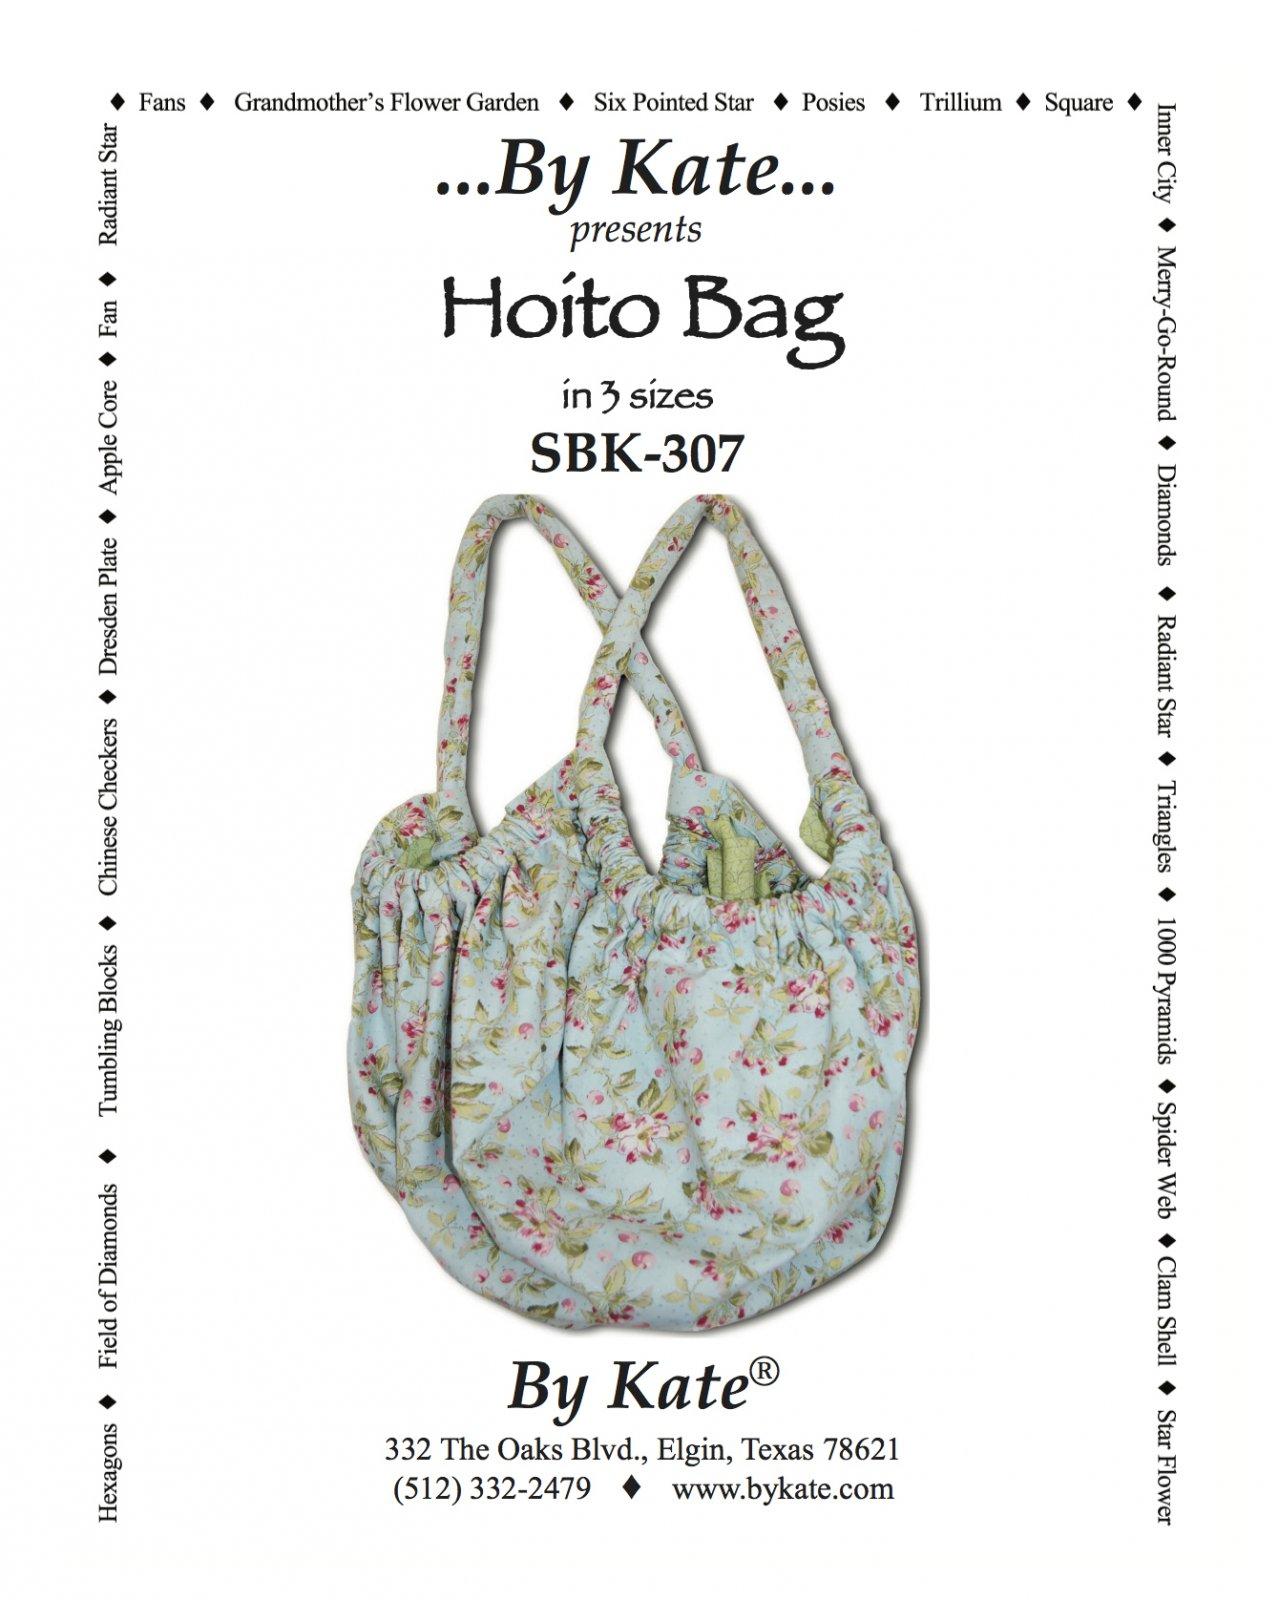 The Hoito Bag